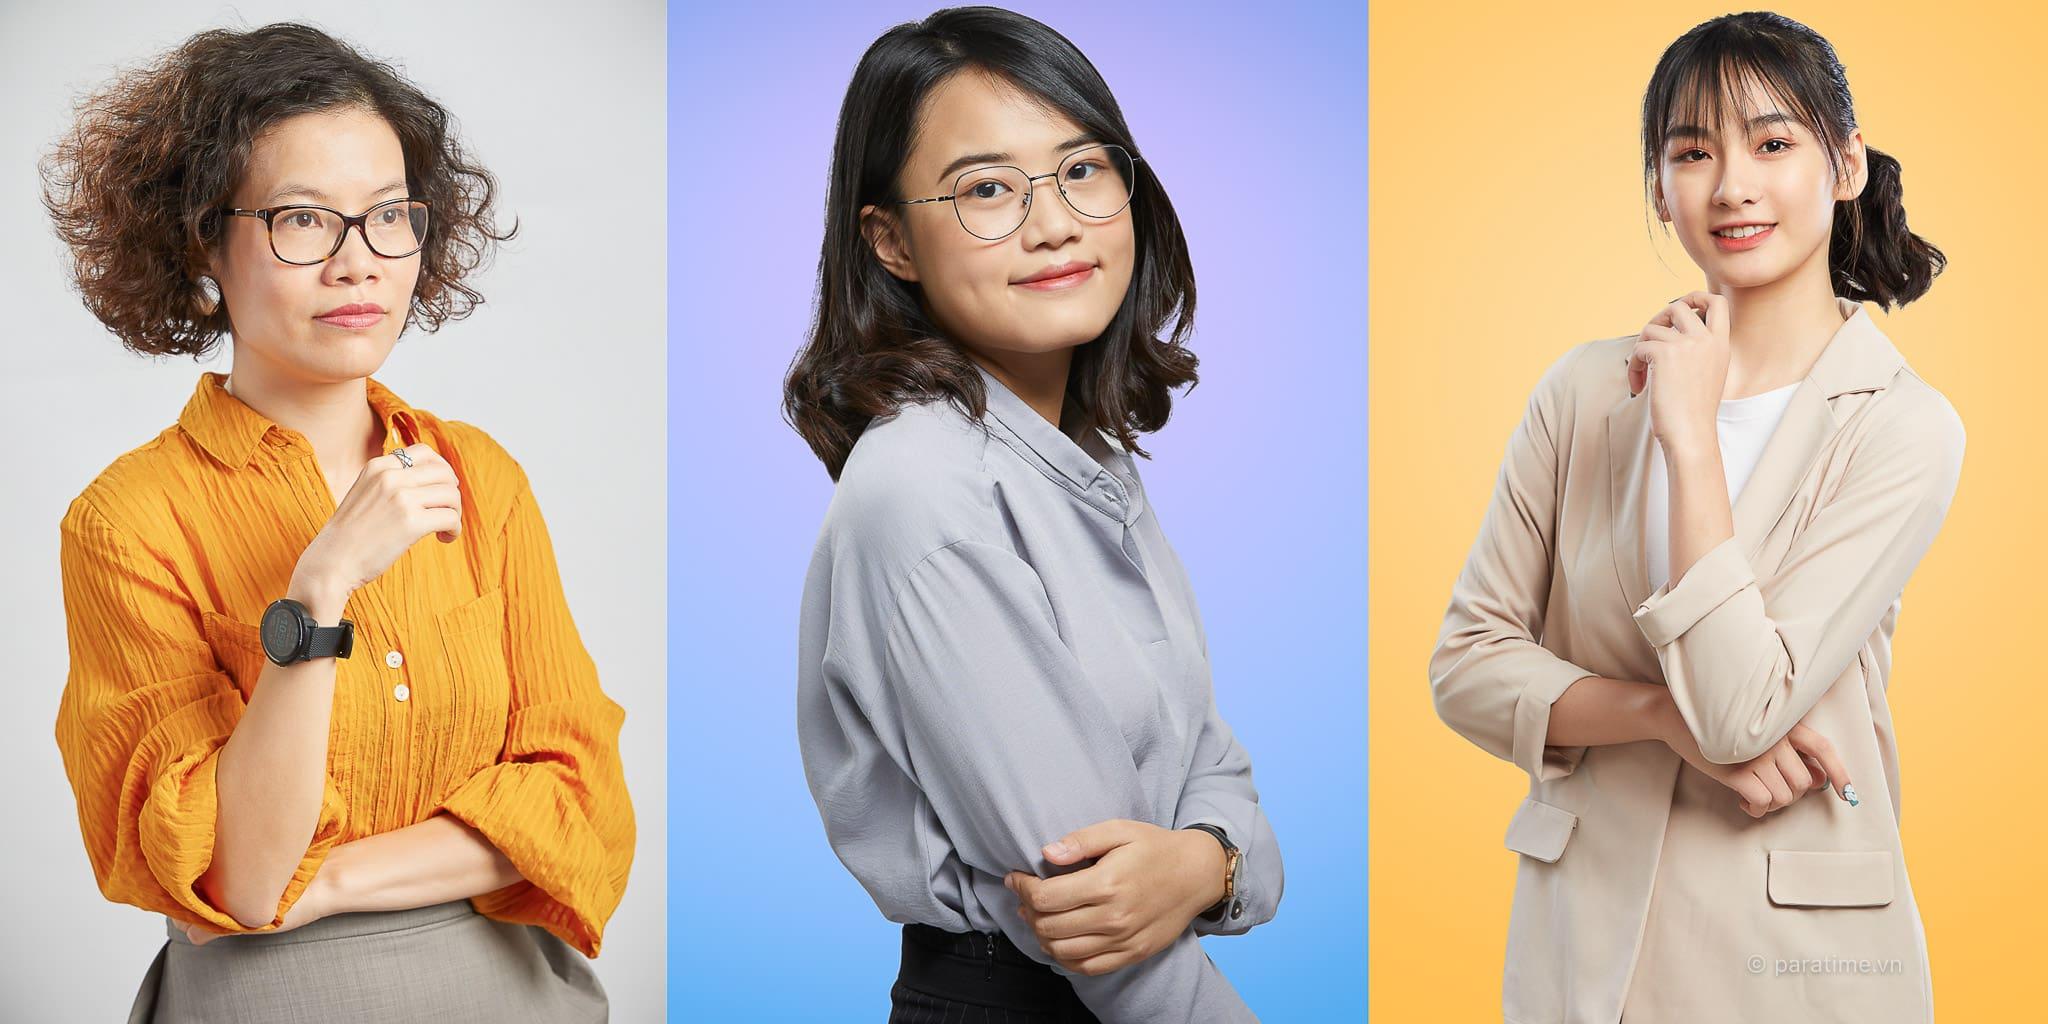 Professional Portraits by Paratime Studio